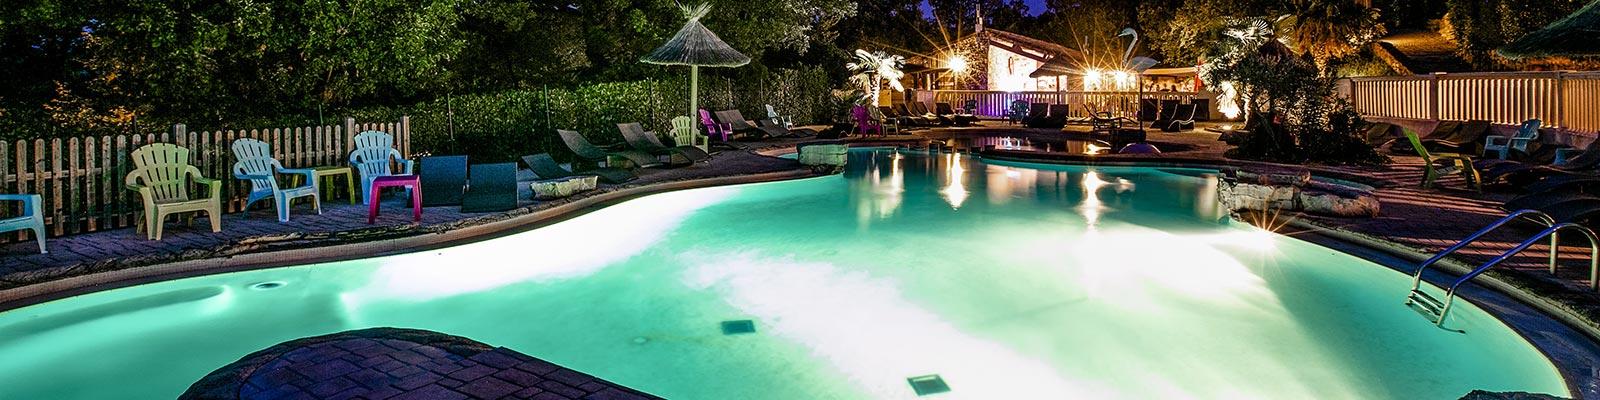 piscine la nuit camping ardeche